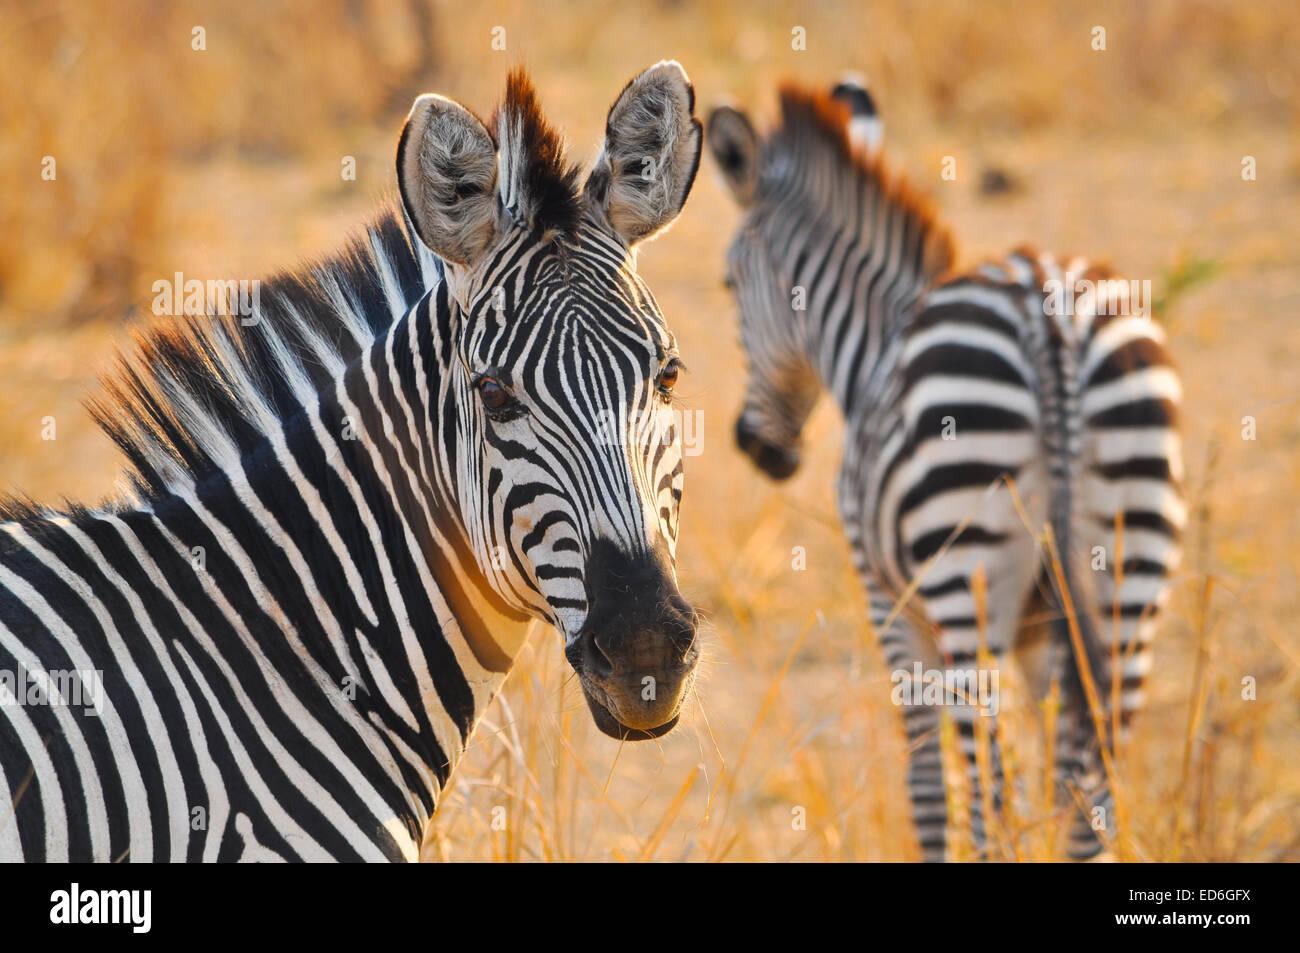 Zebras in Zambia, South Luangwa Park - Stock Image